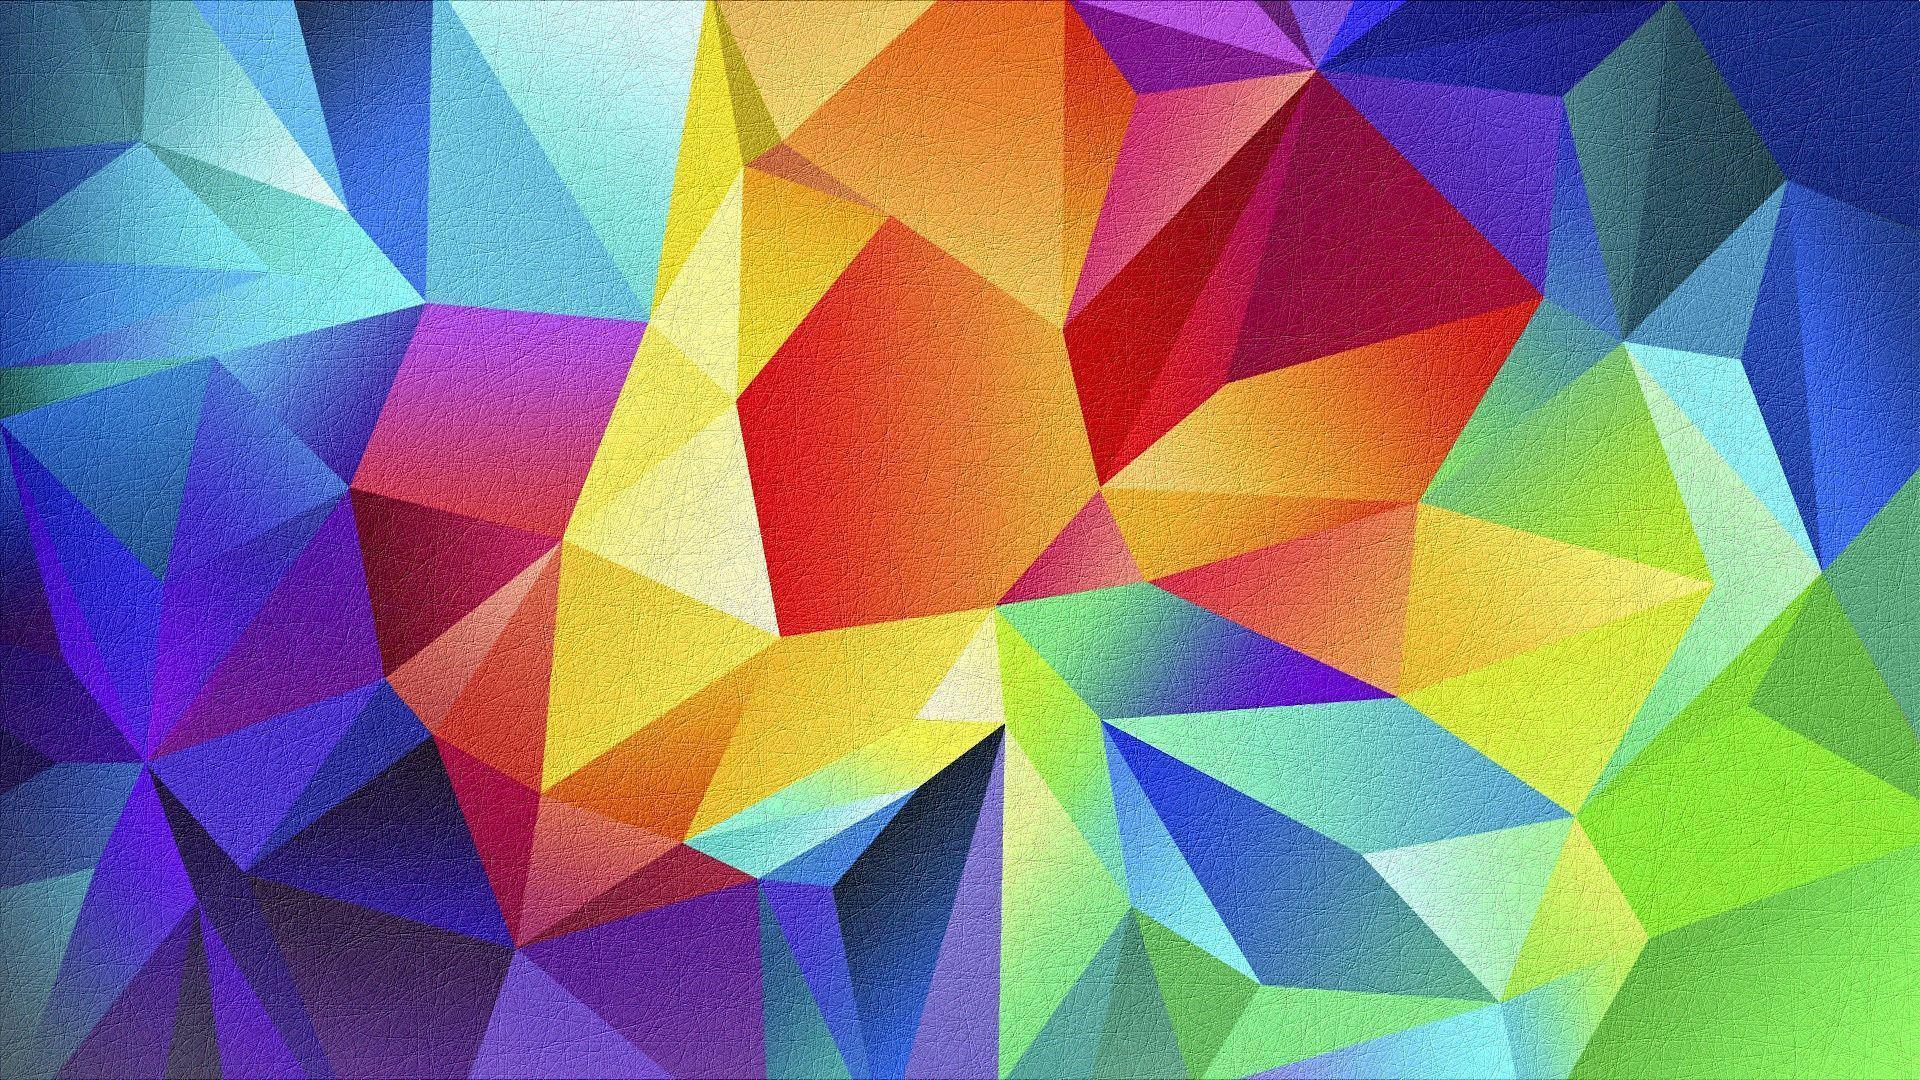 geometric wallpaper HD - wallpaper12.com